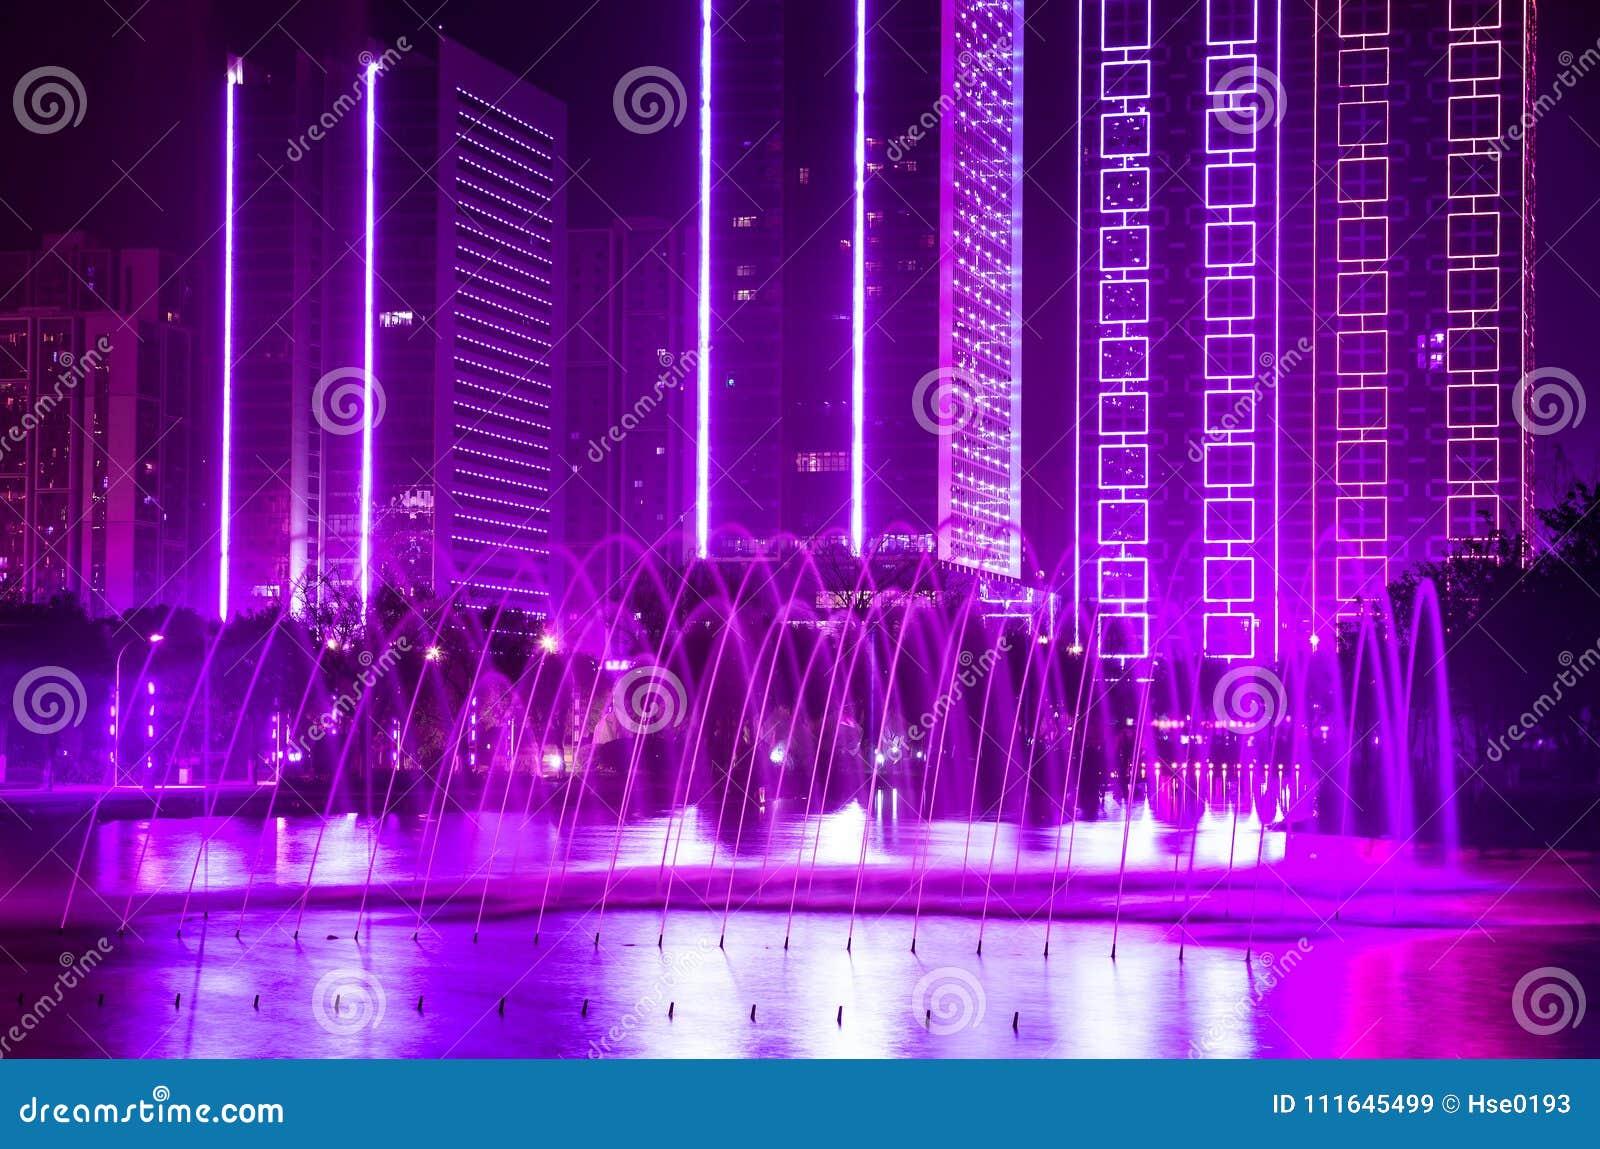 Fontana costruente con le luci decorative ultraviolette - Luci decorative ...